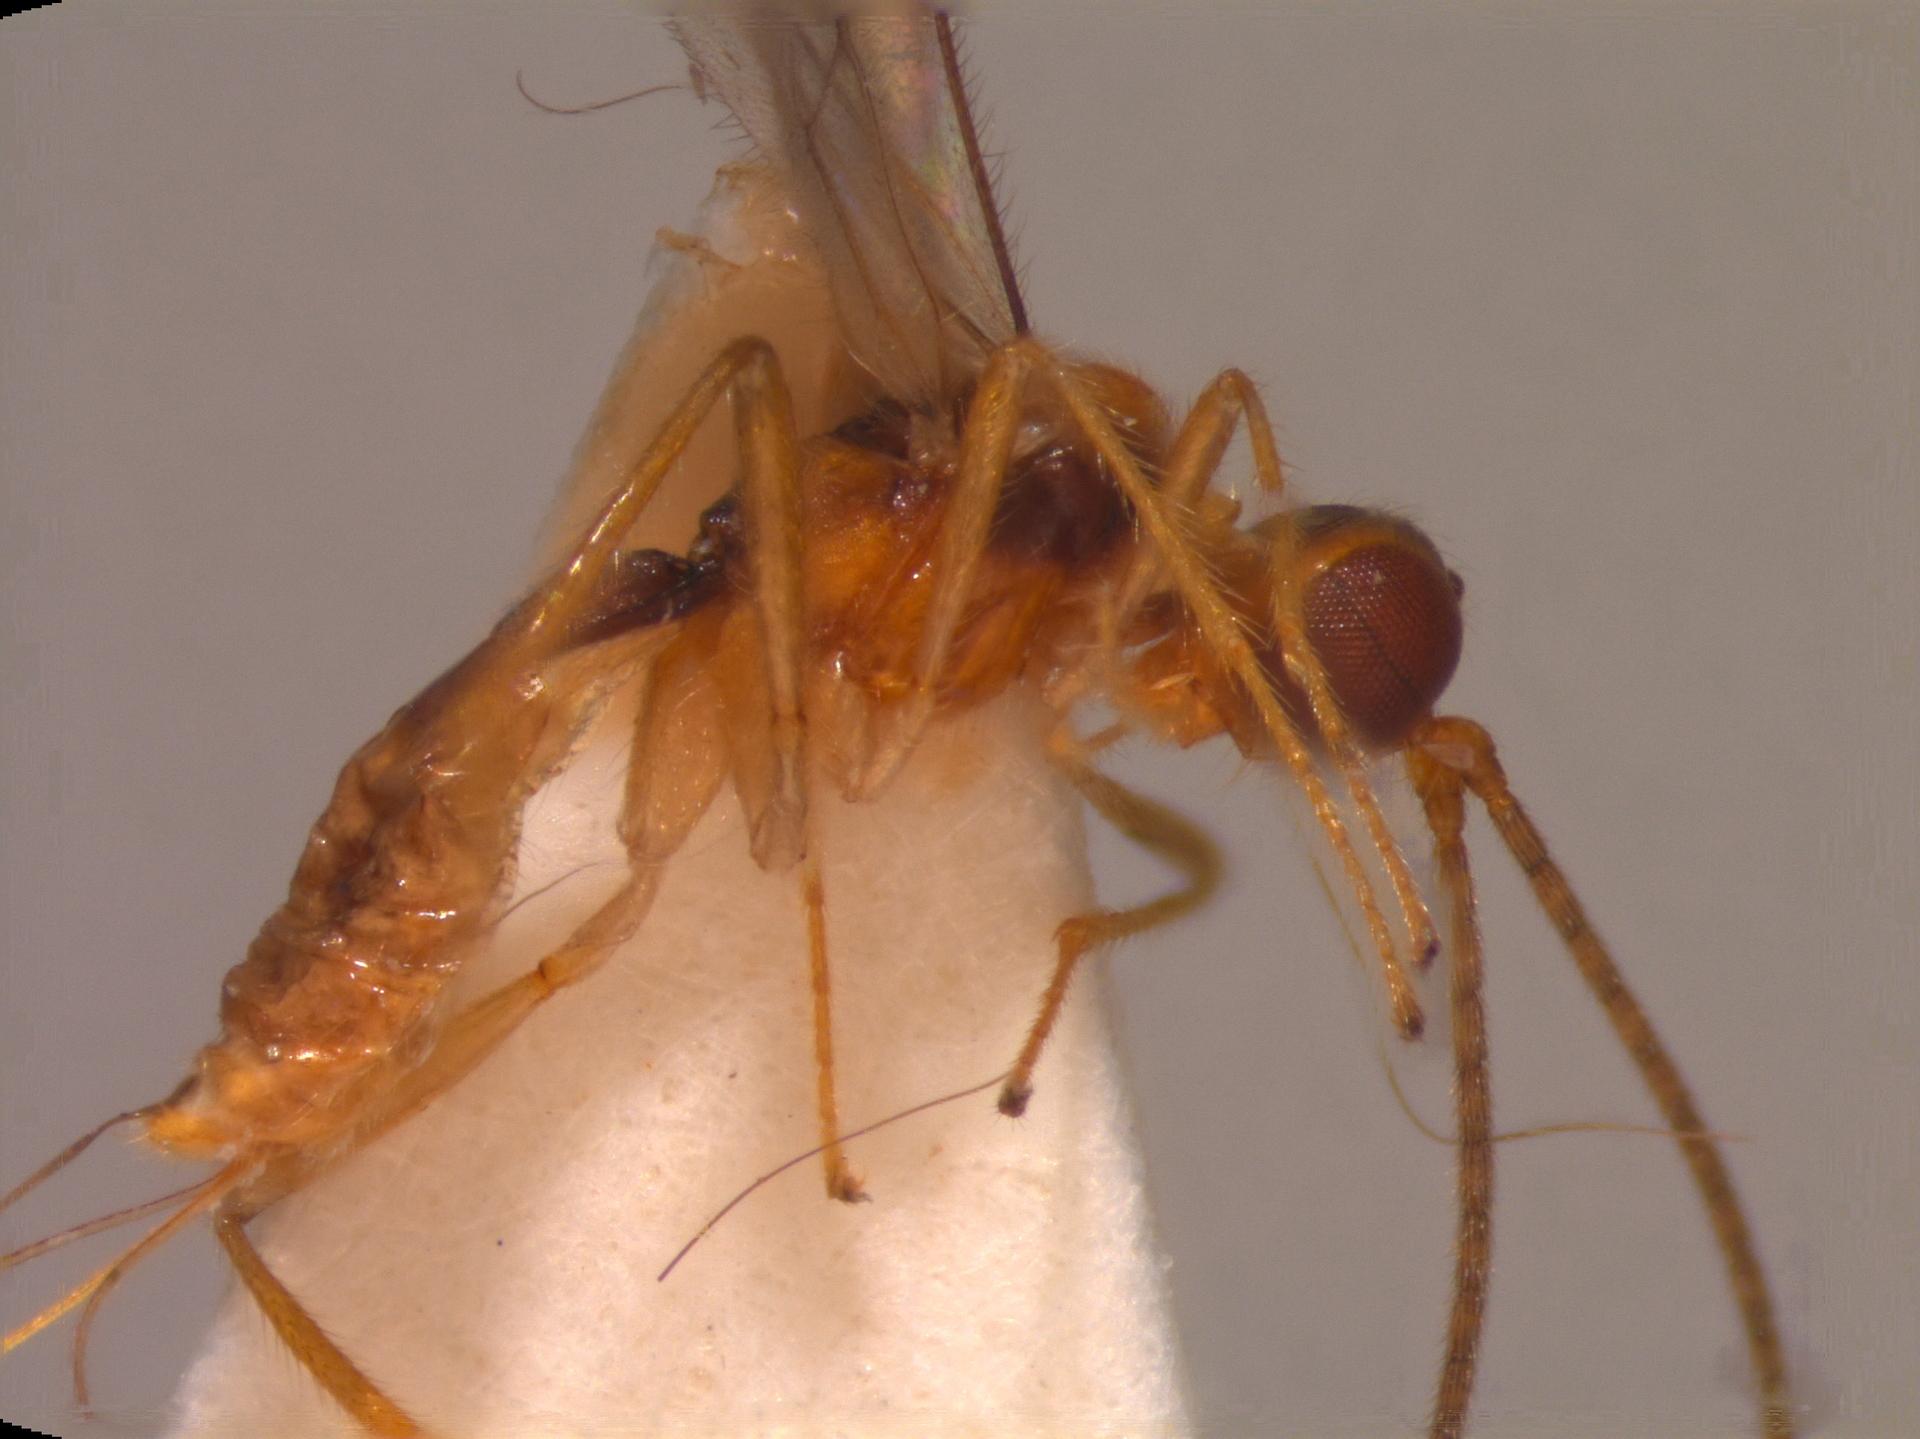 RMNH.INS.109692 | Pseudorhysipolis fenix Scatolini & Penteado-Dias, 2002